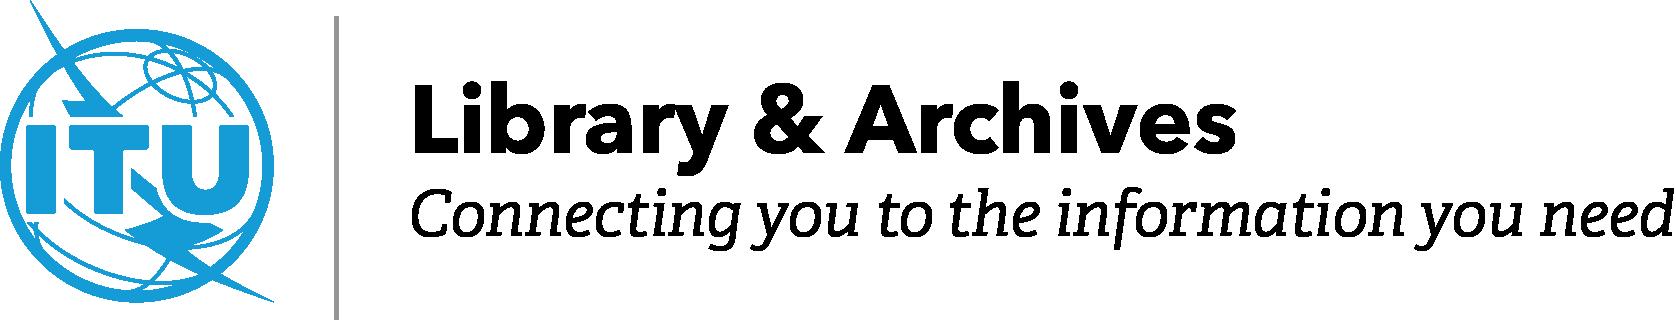 library logo banner